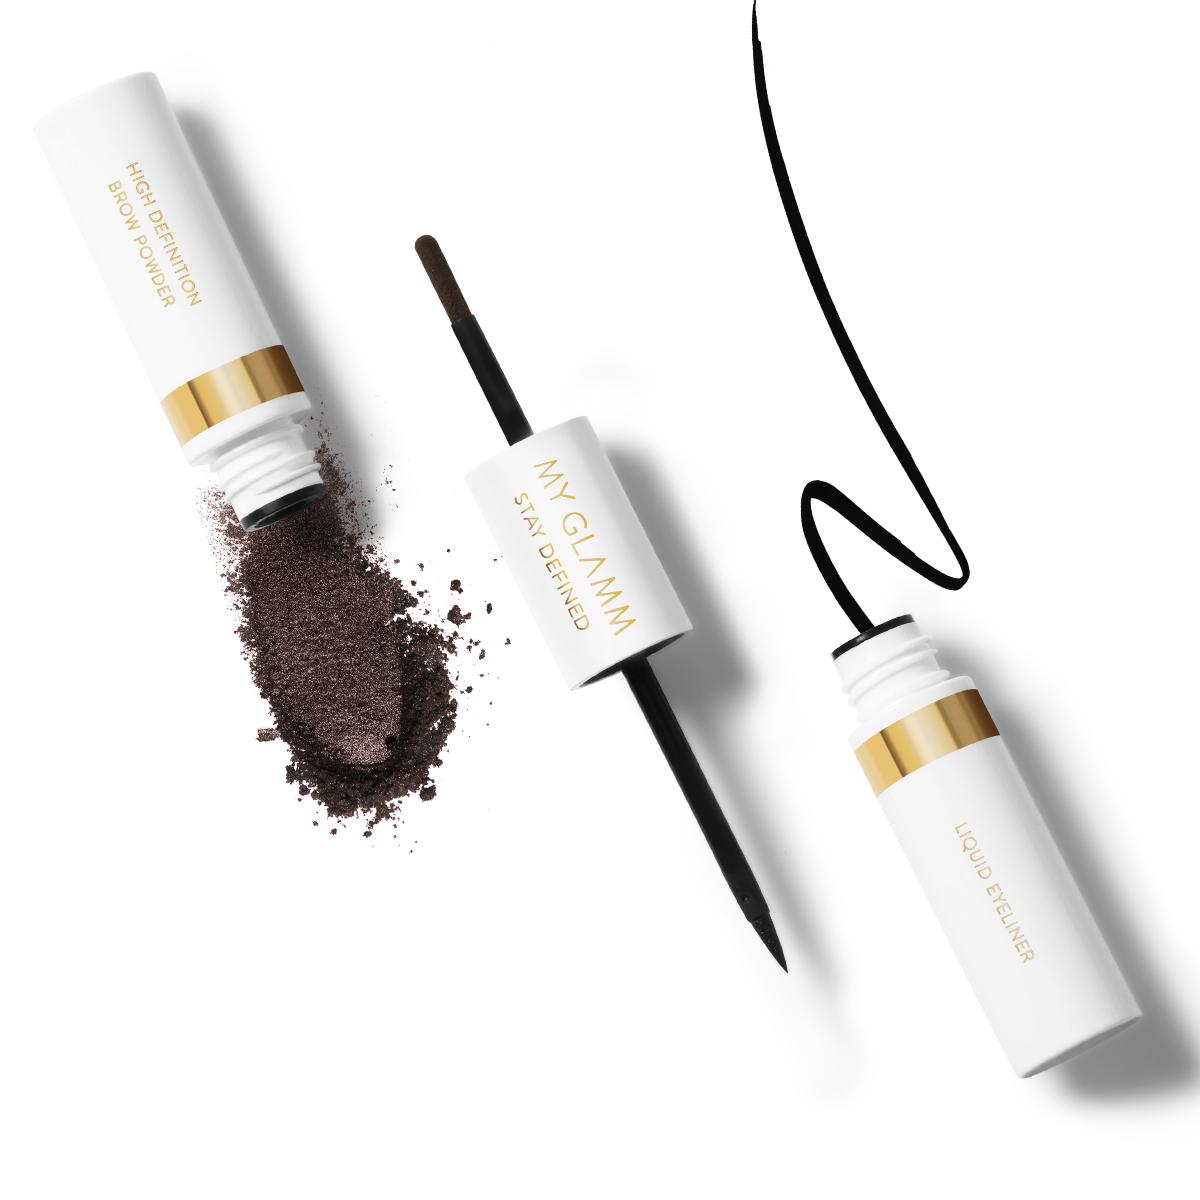 STAY DEFINED 2 in 1 Liquid Eyeliner + HD Brow Powder